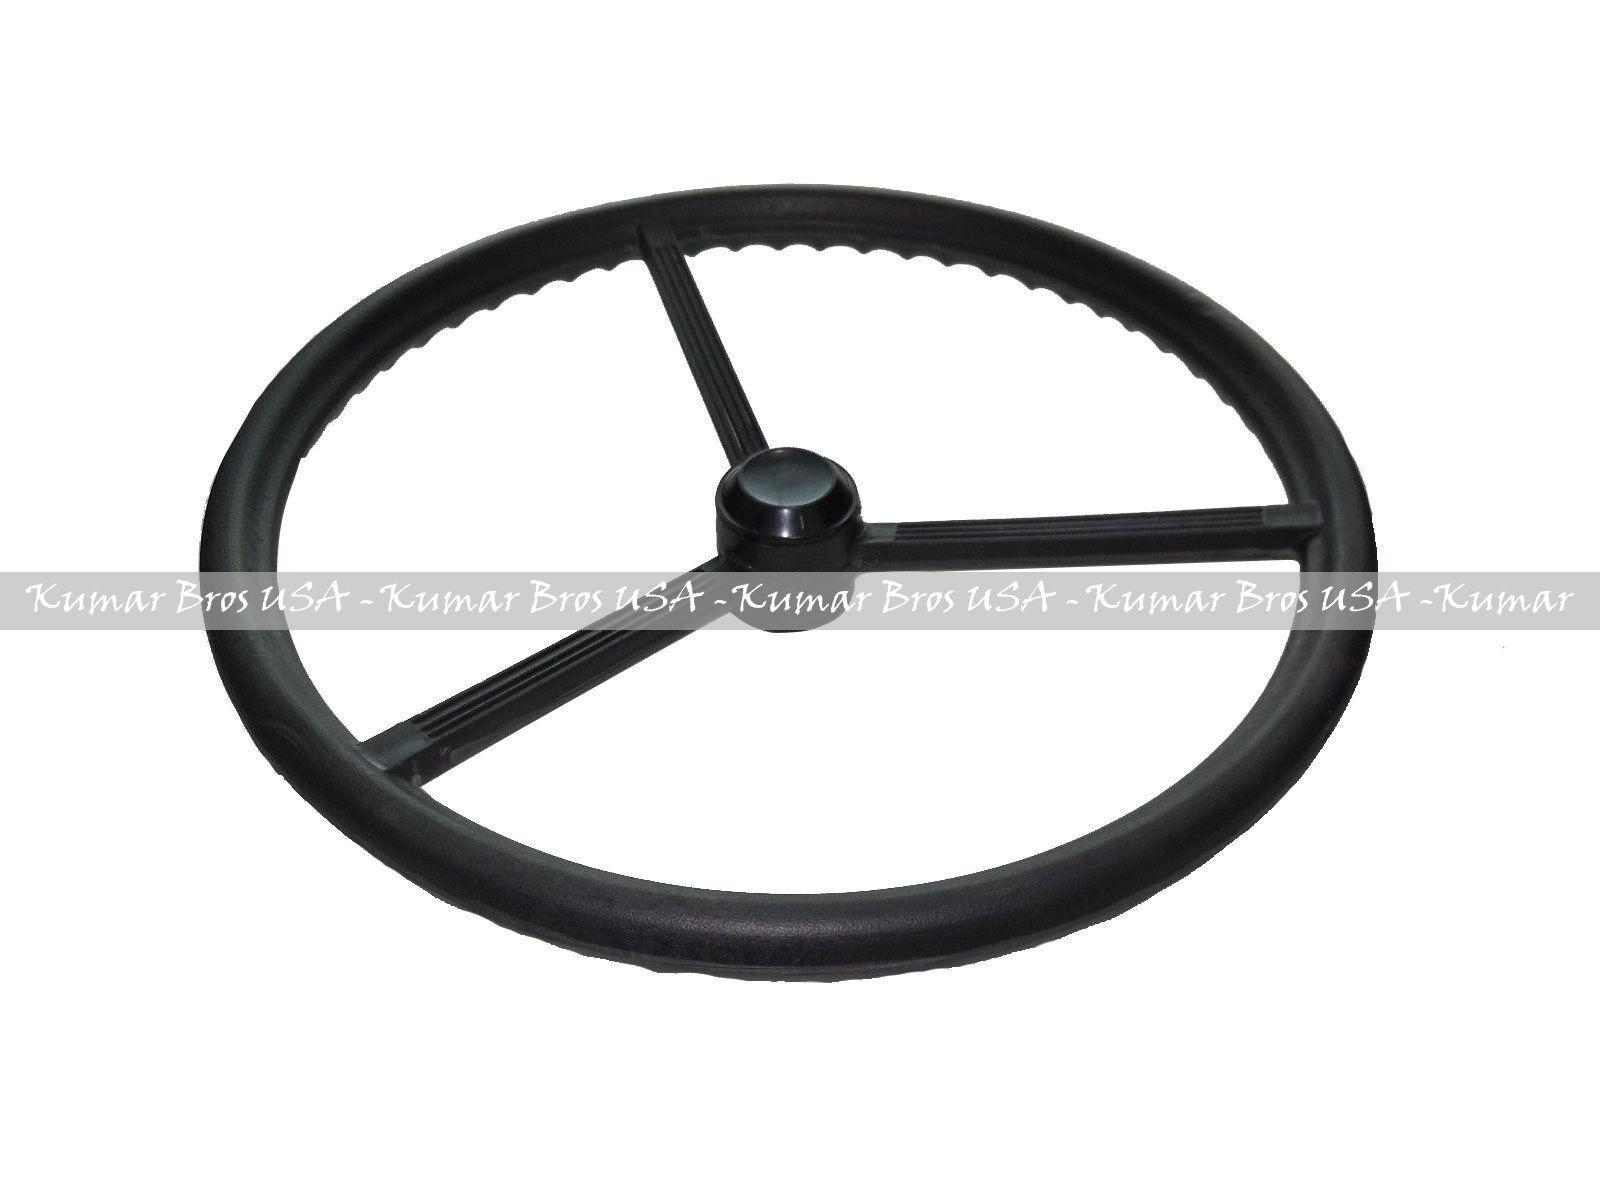 8N3600 New Steering Wheel suitable for Ford 8N NAA 800 600 601 2000 4000